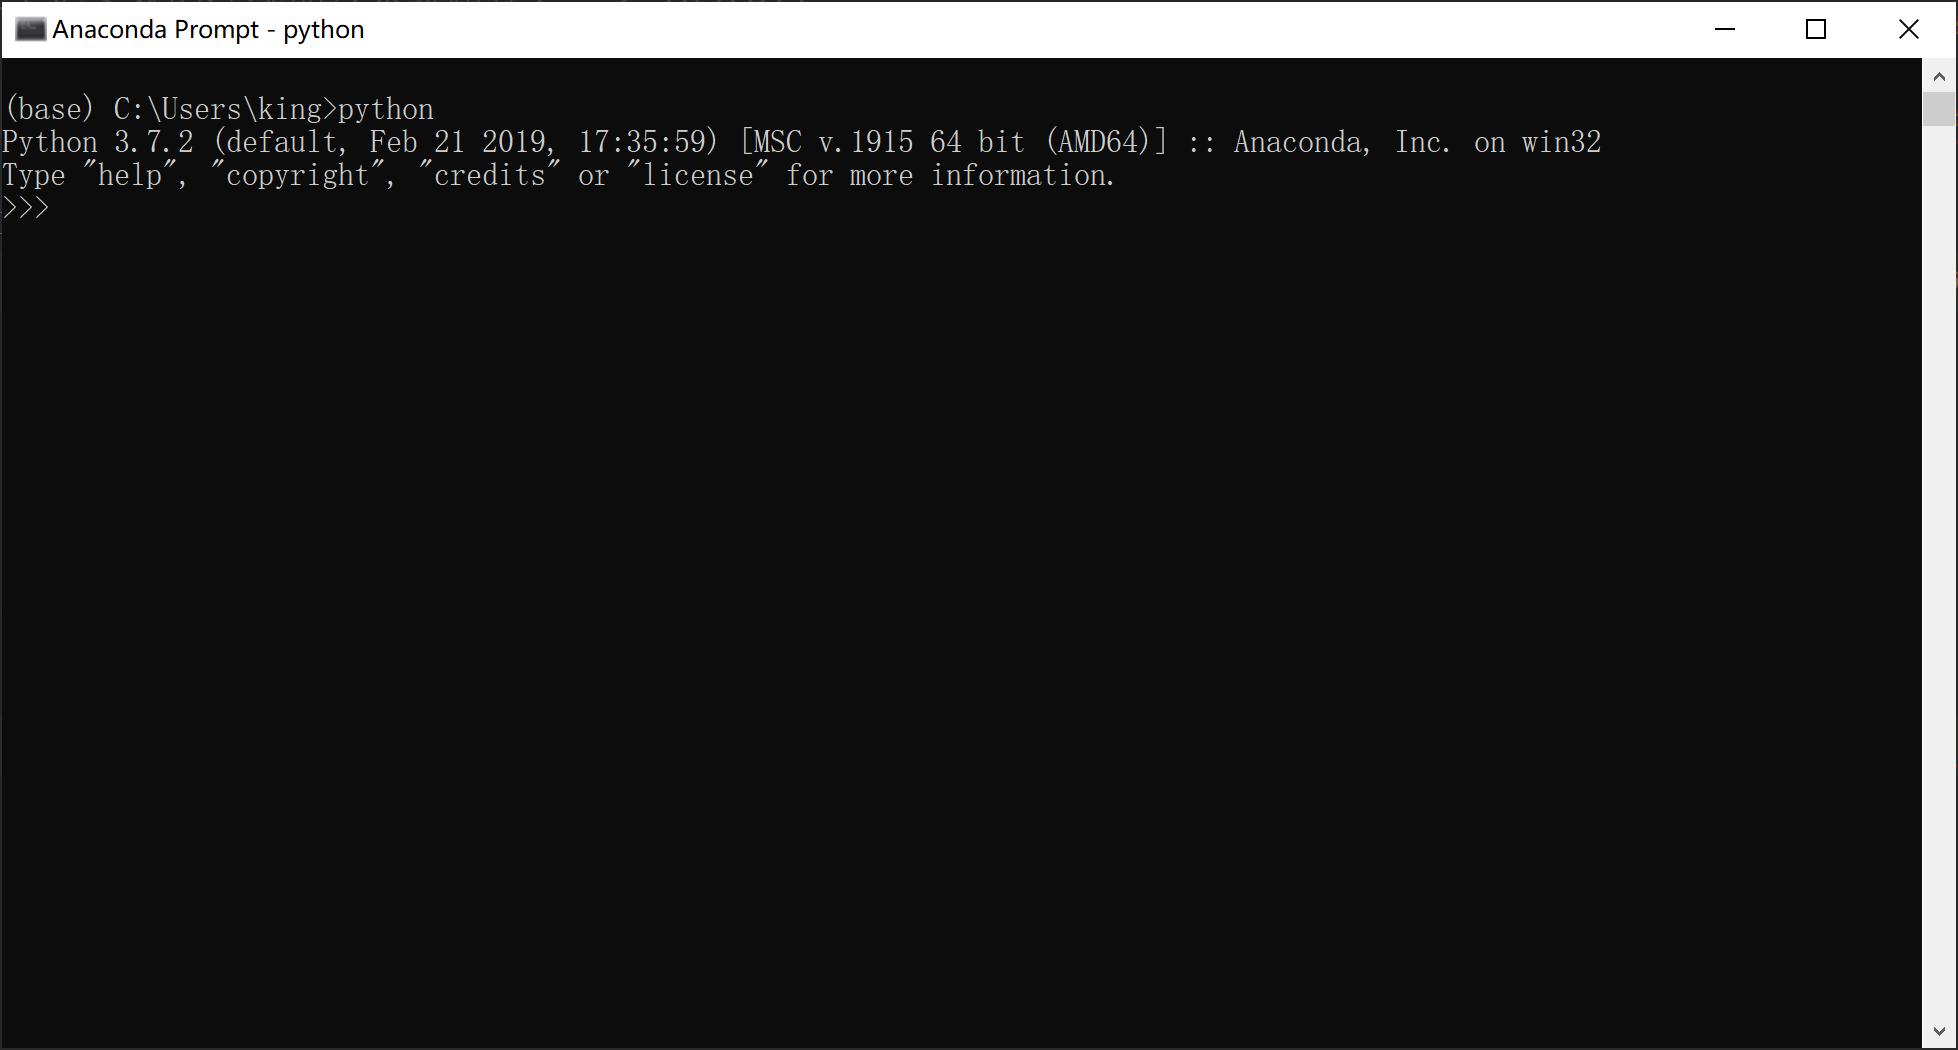 https://jfds-1252952517.cos.ap-chengdu.myqcloud.com/akshare/readme/anaconda/virtual_env/anaconda_prompt_1.png